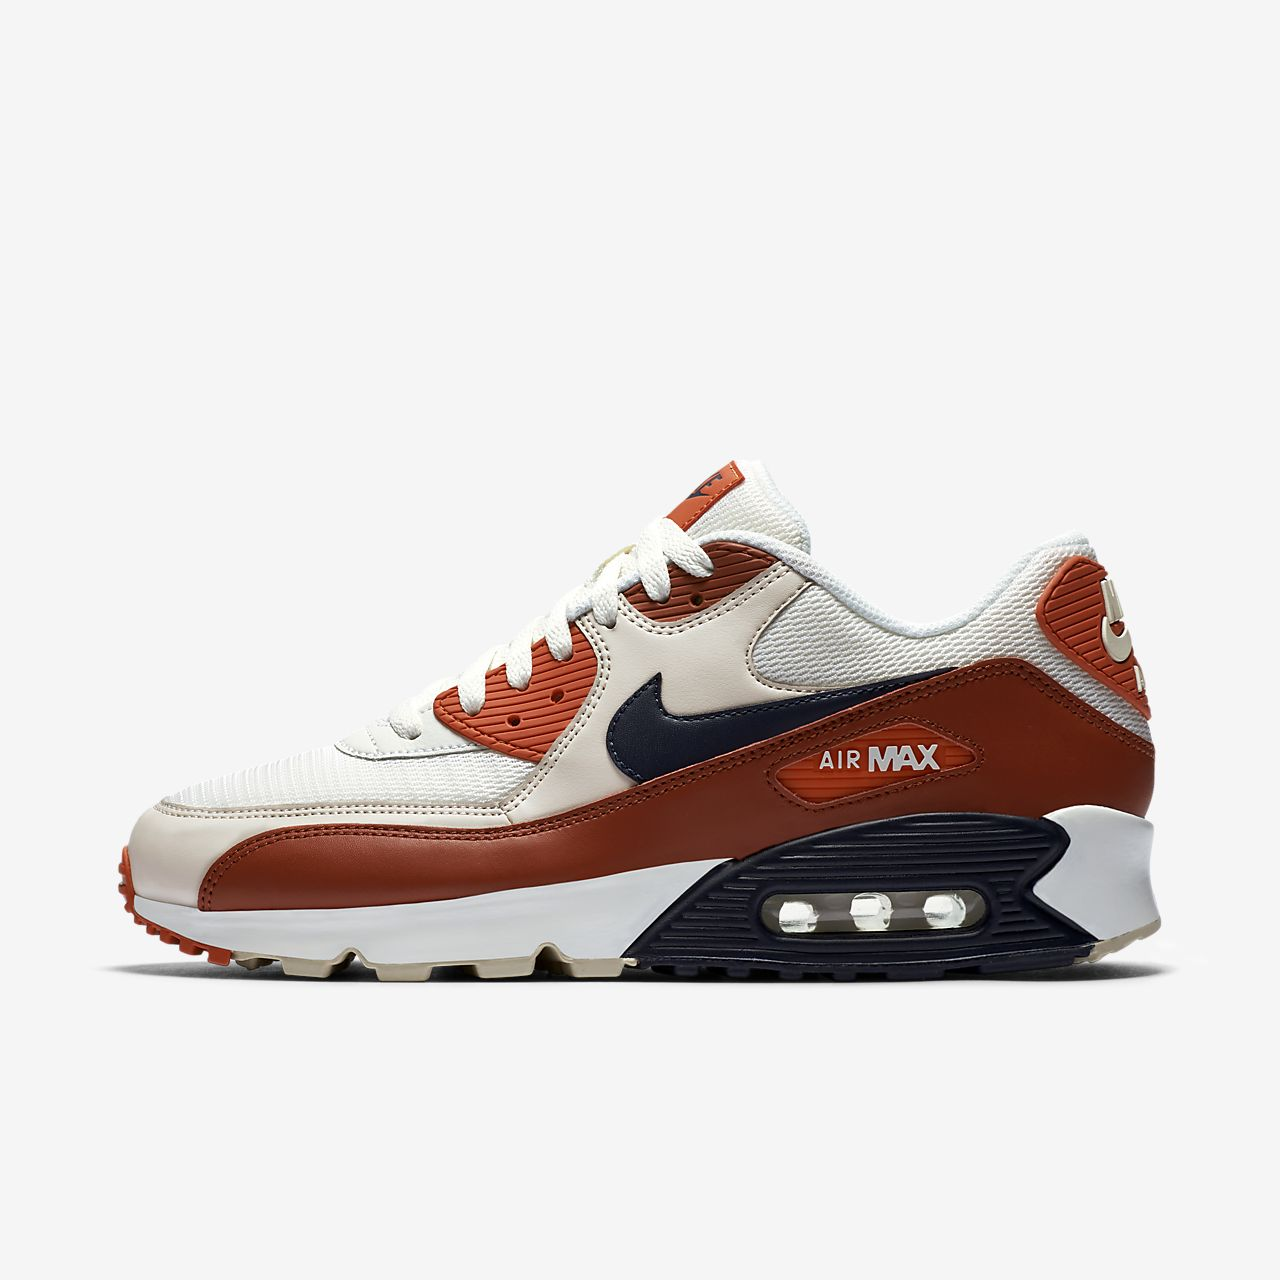 Nike Chaussures AIR MAX '90 ESSENTIAL